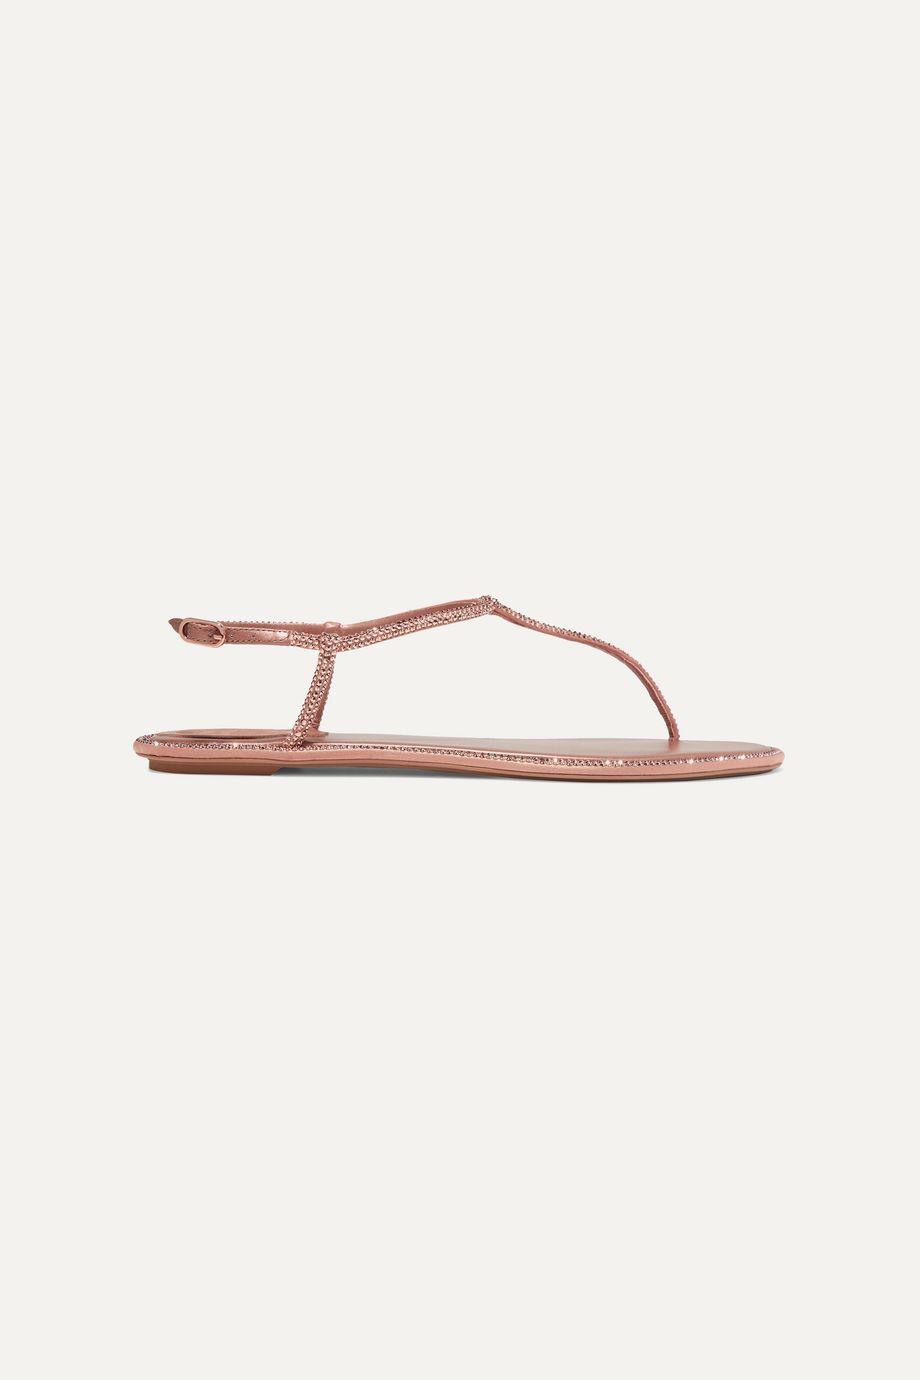 René Caovilla Diana 水晶缀饰皮革缎布凉鞋